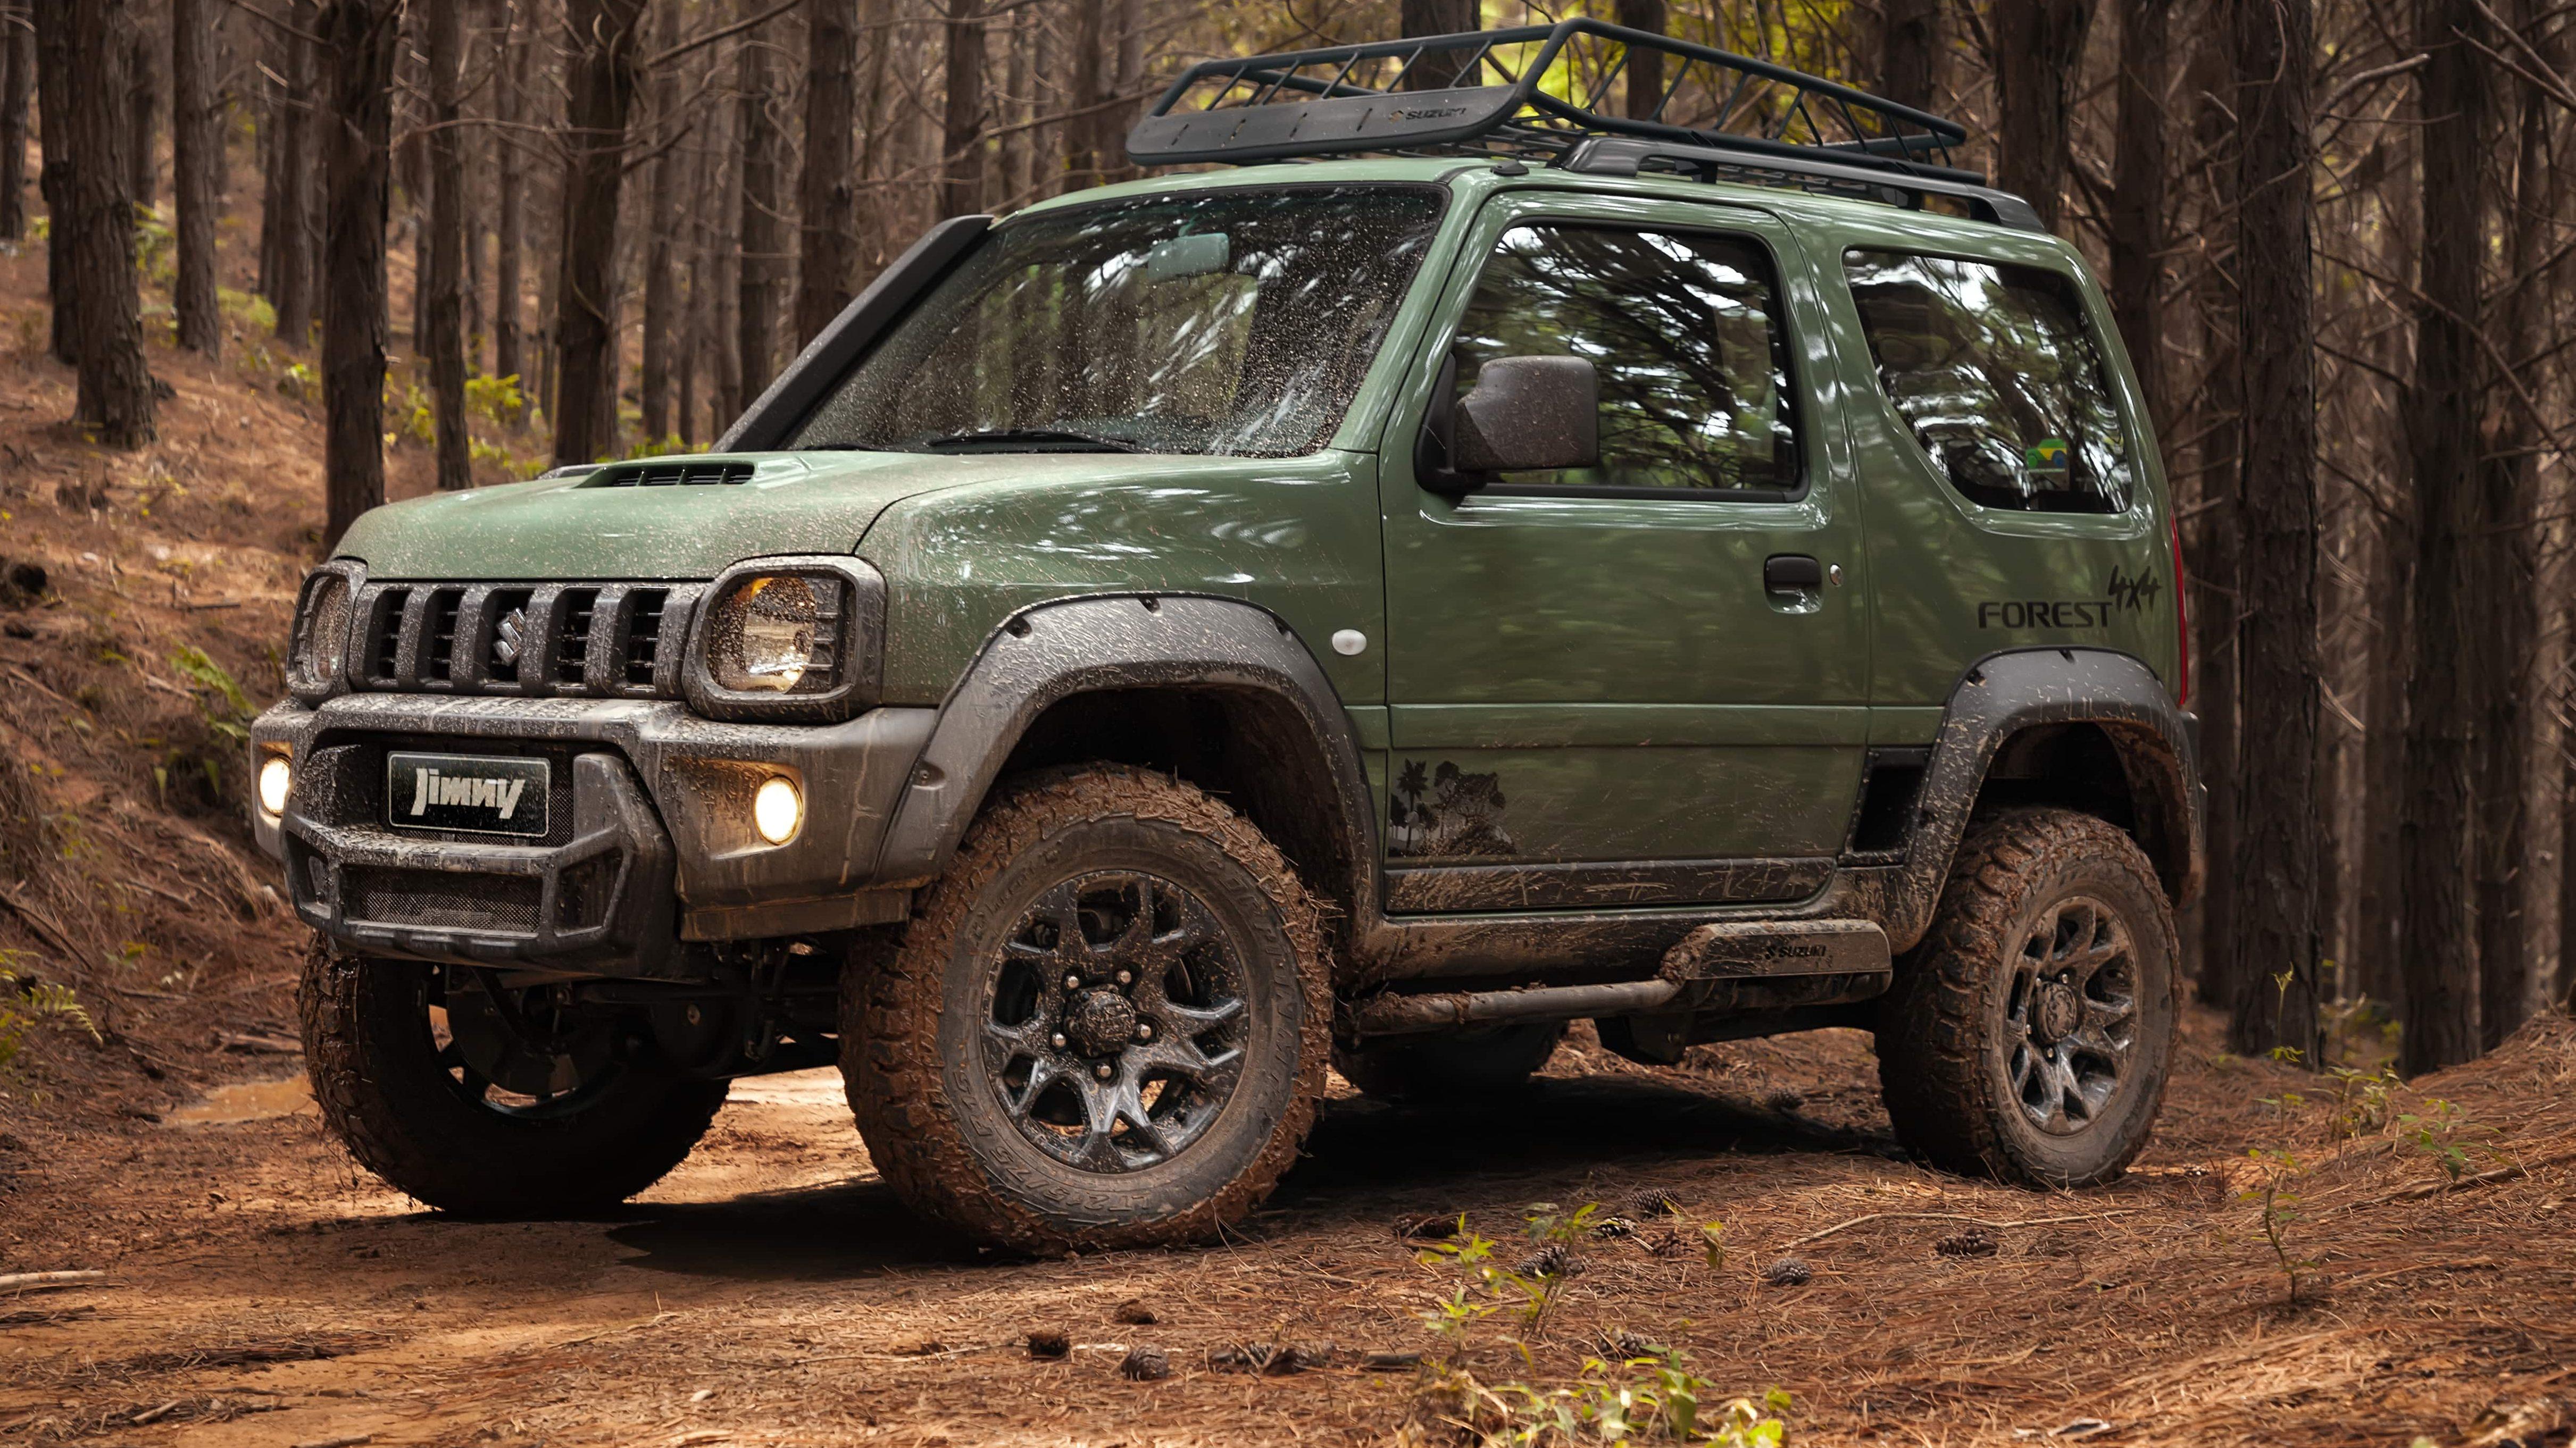 Suzuki Jimny Forest 2022